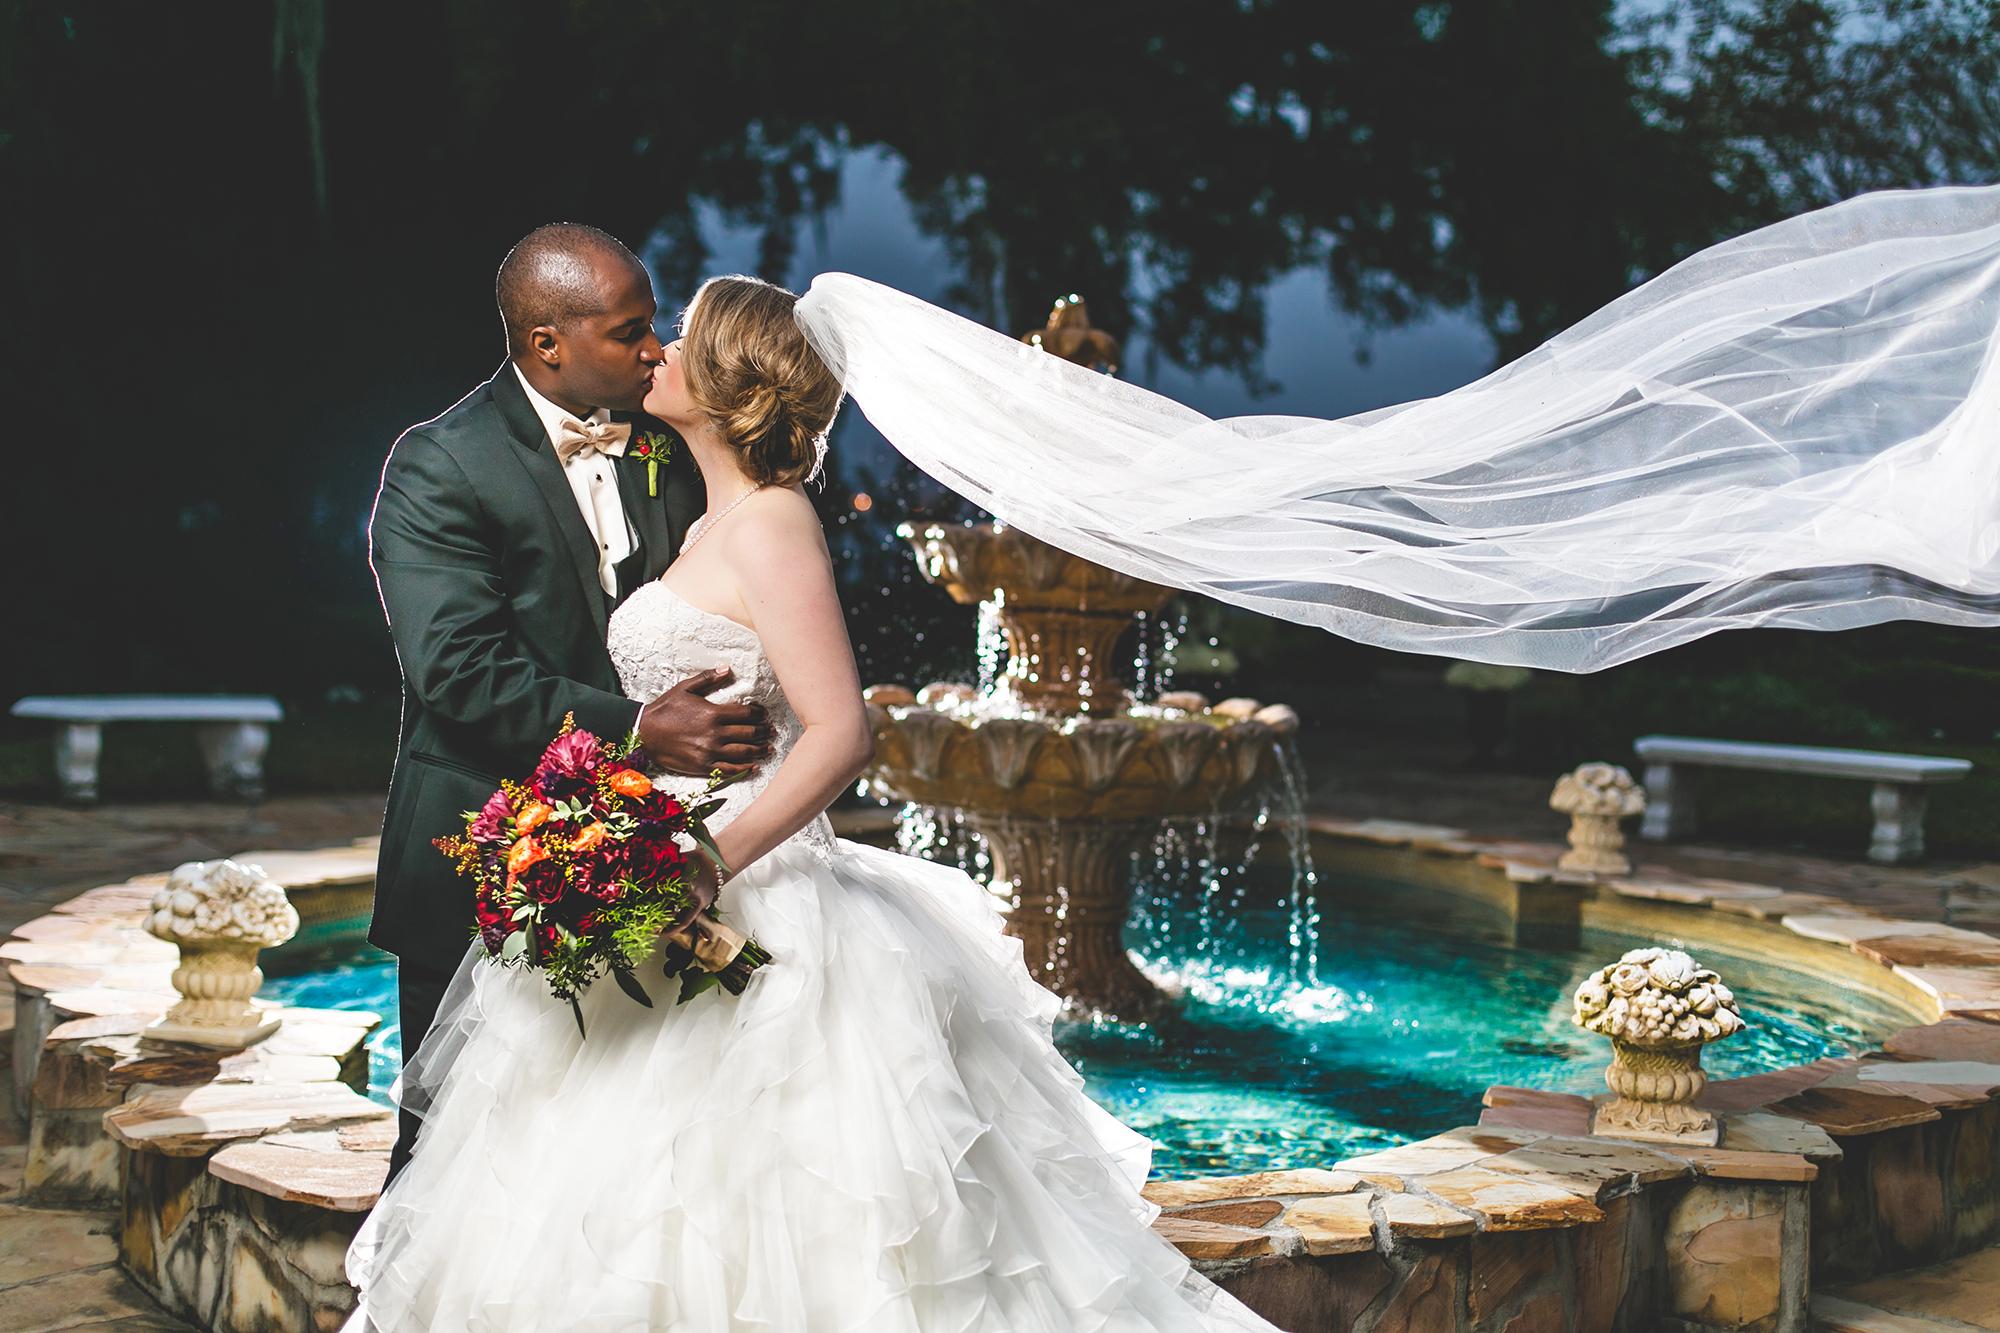 adam-szarmack-wedding-bride-groom-kiss-fountain.jpg